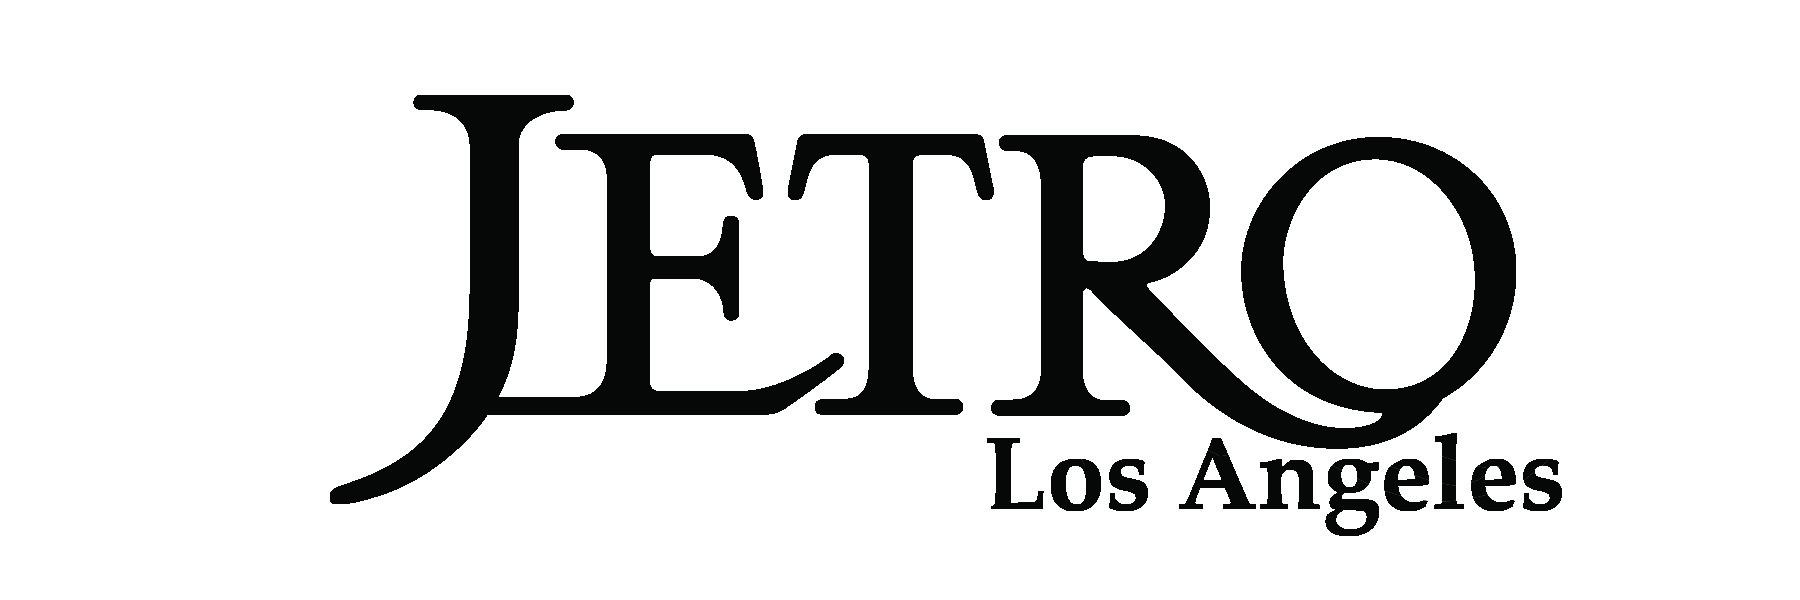 JETRO Los Angeles Logo